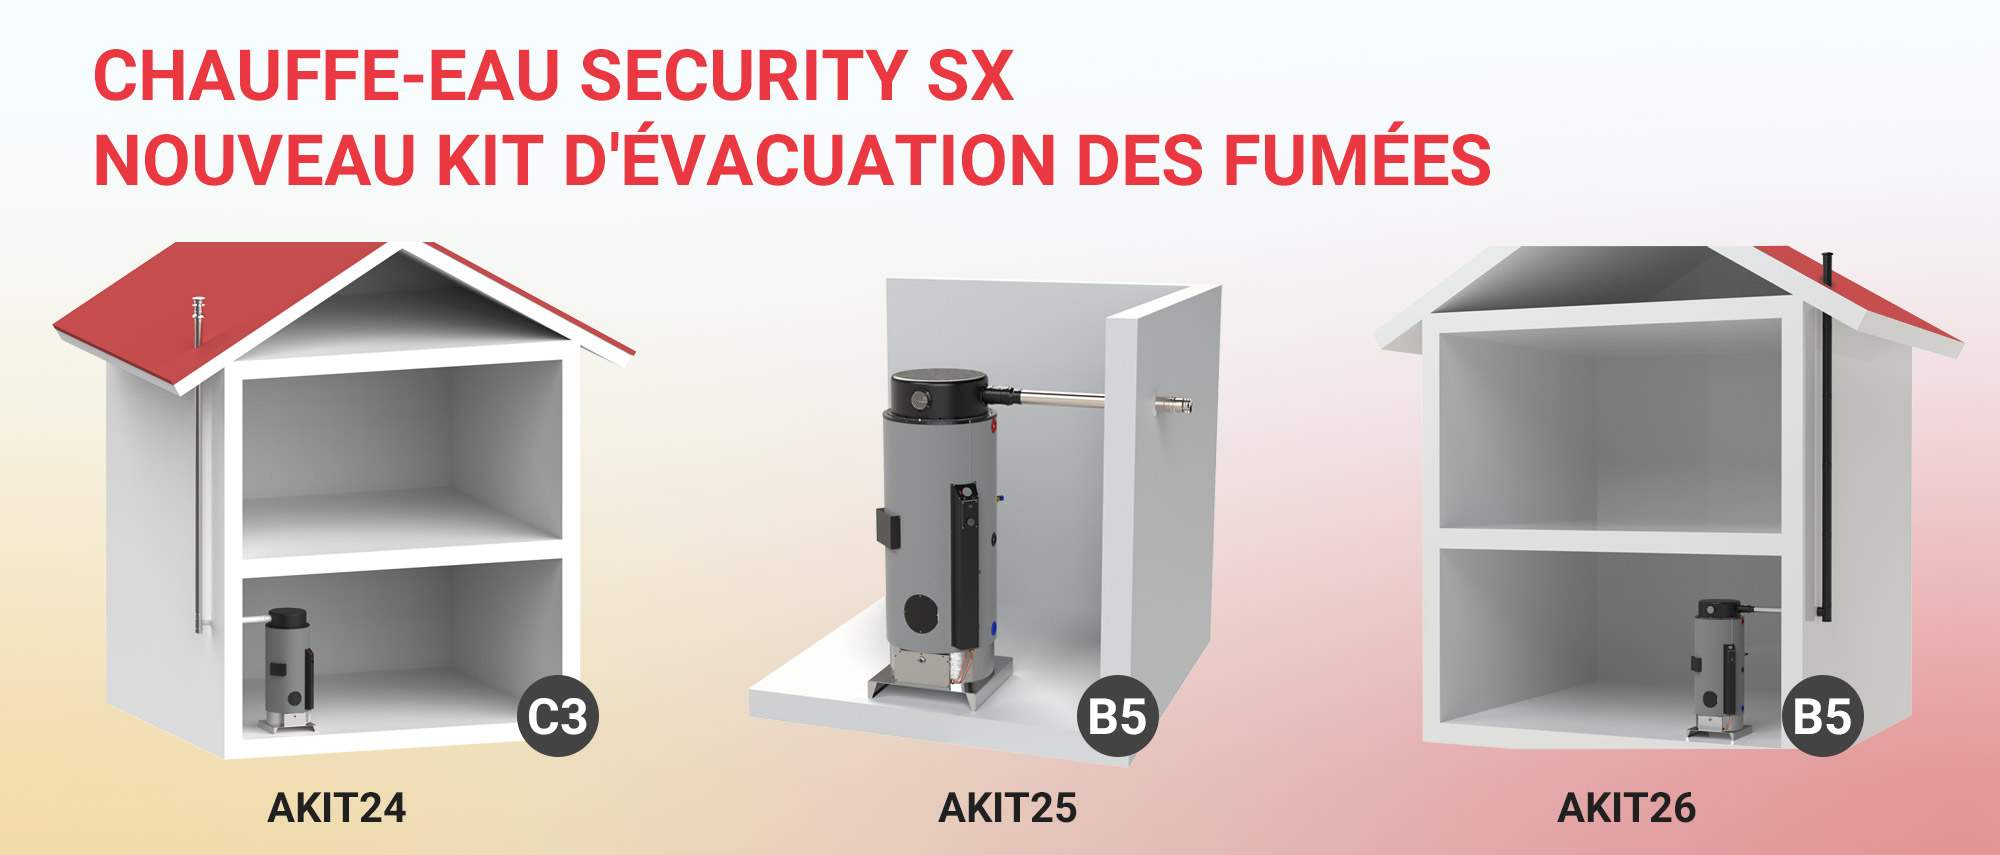 Flue Kits Security SX